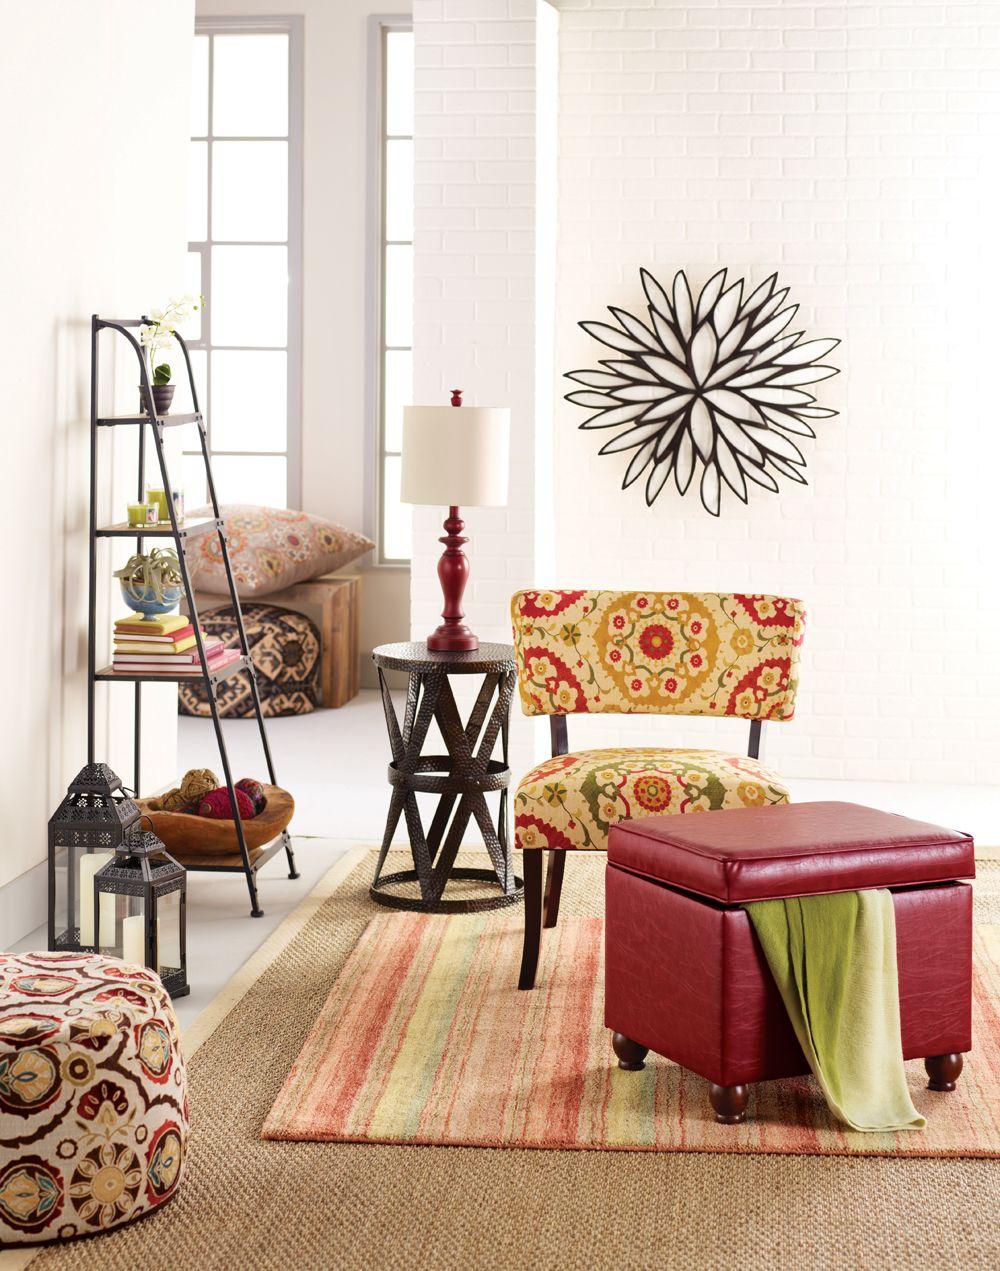 Living Room Furniture Furniture Decor Kohl S Living Room